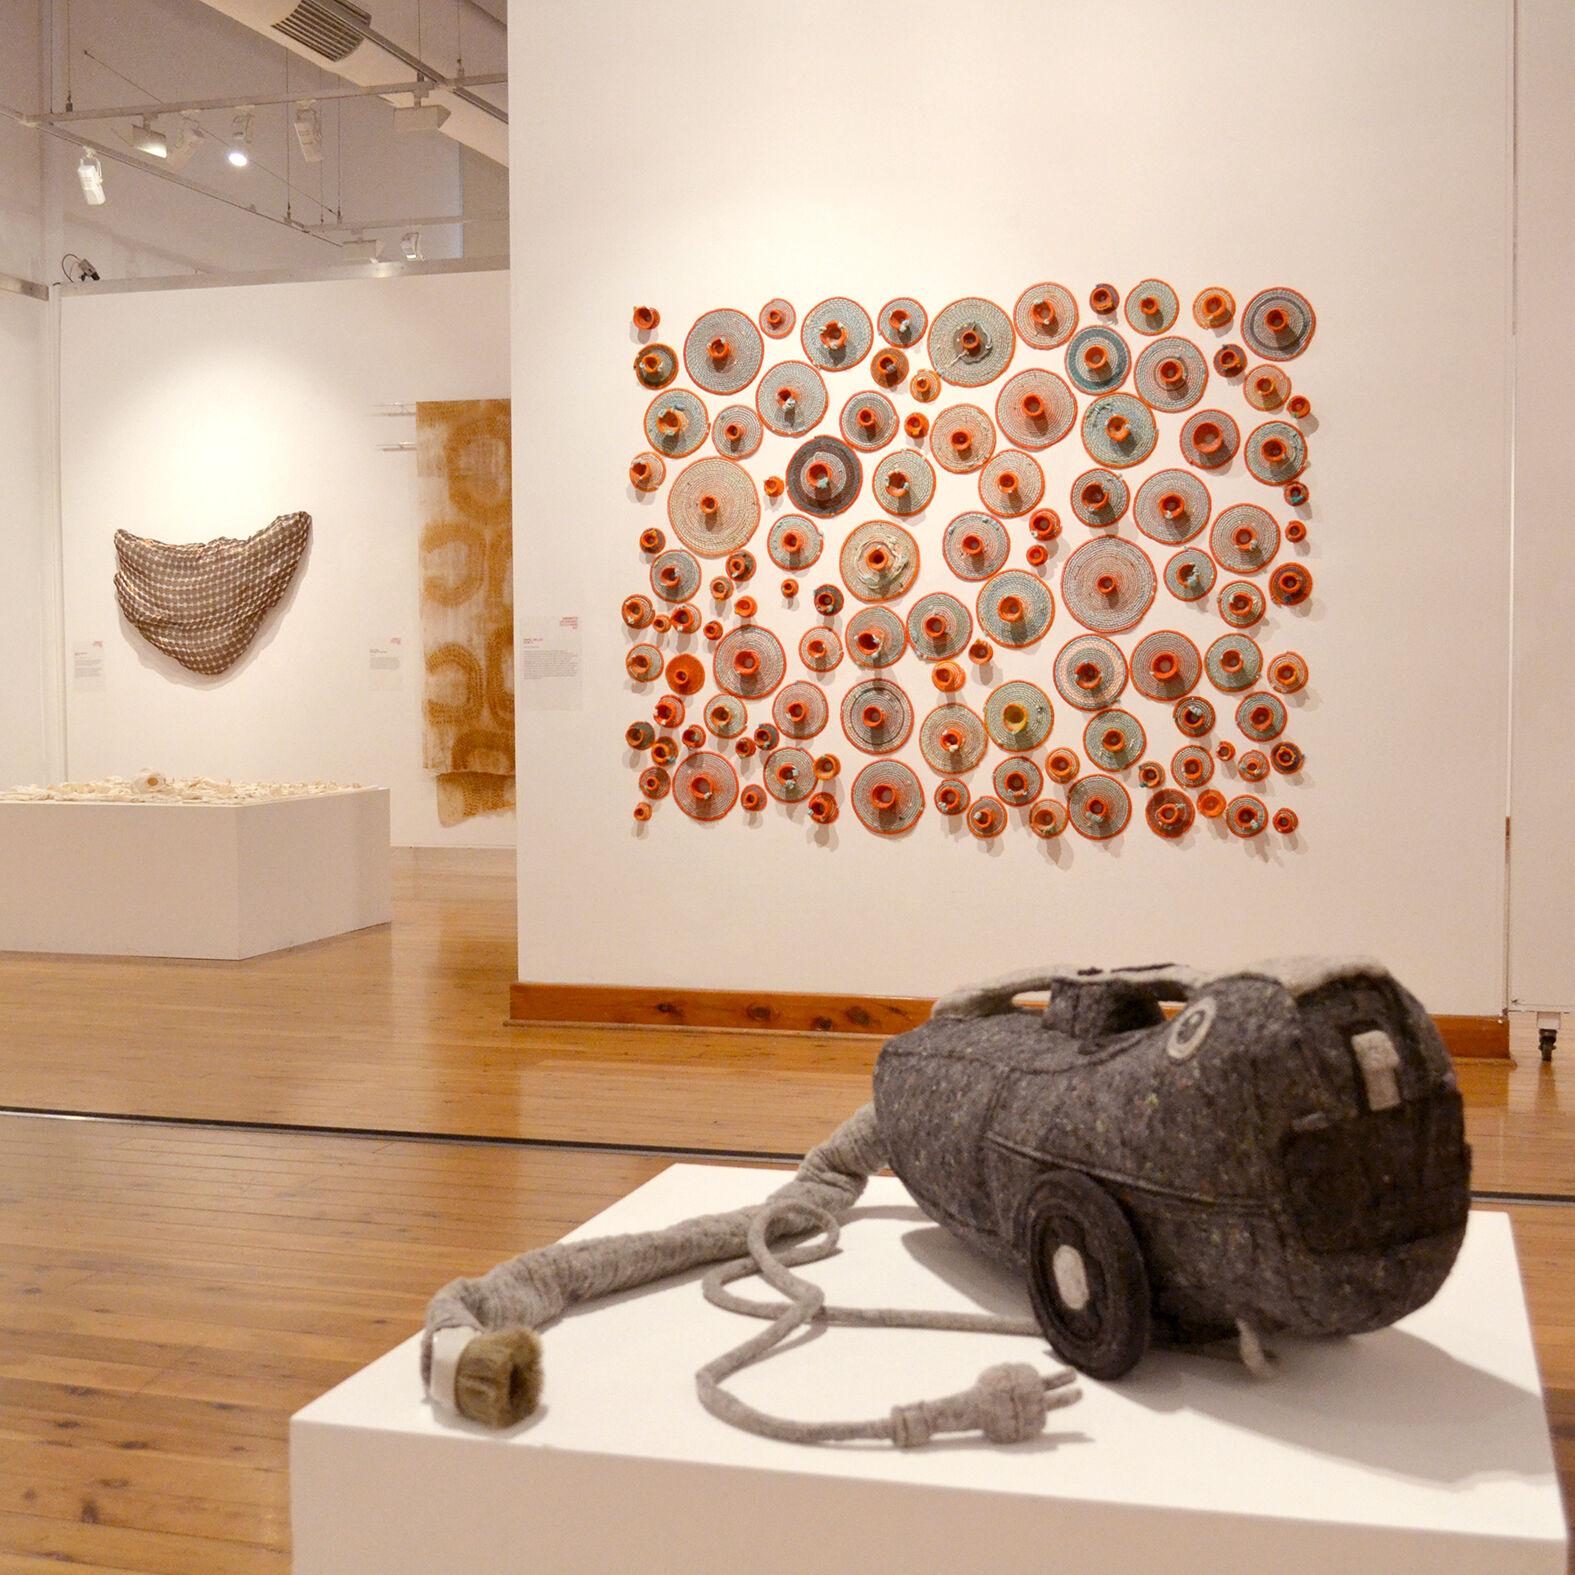 The Wangaratta Contemporary Textile Award 2017, install, Gallery 1, Wangaratta Art Gallery